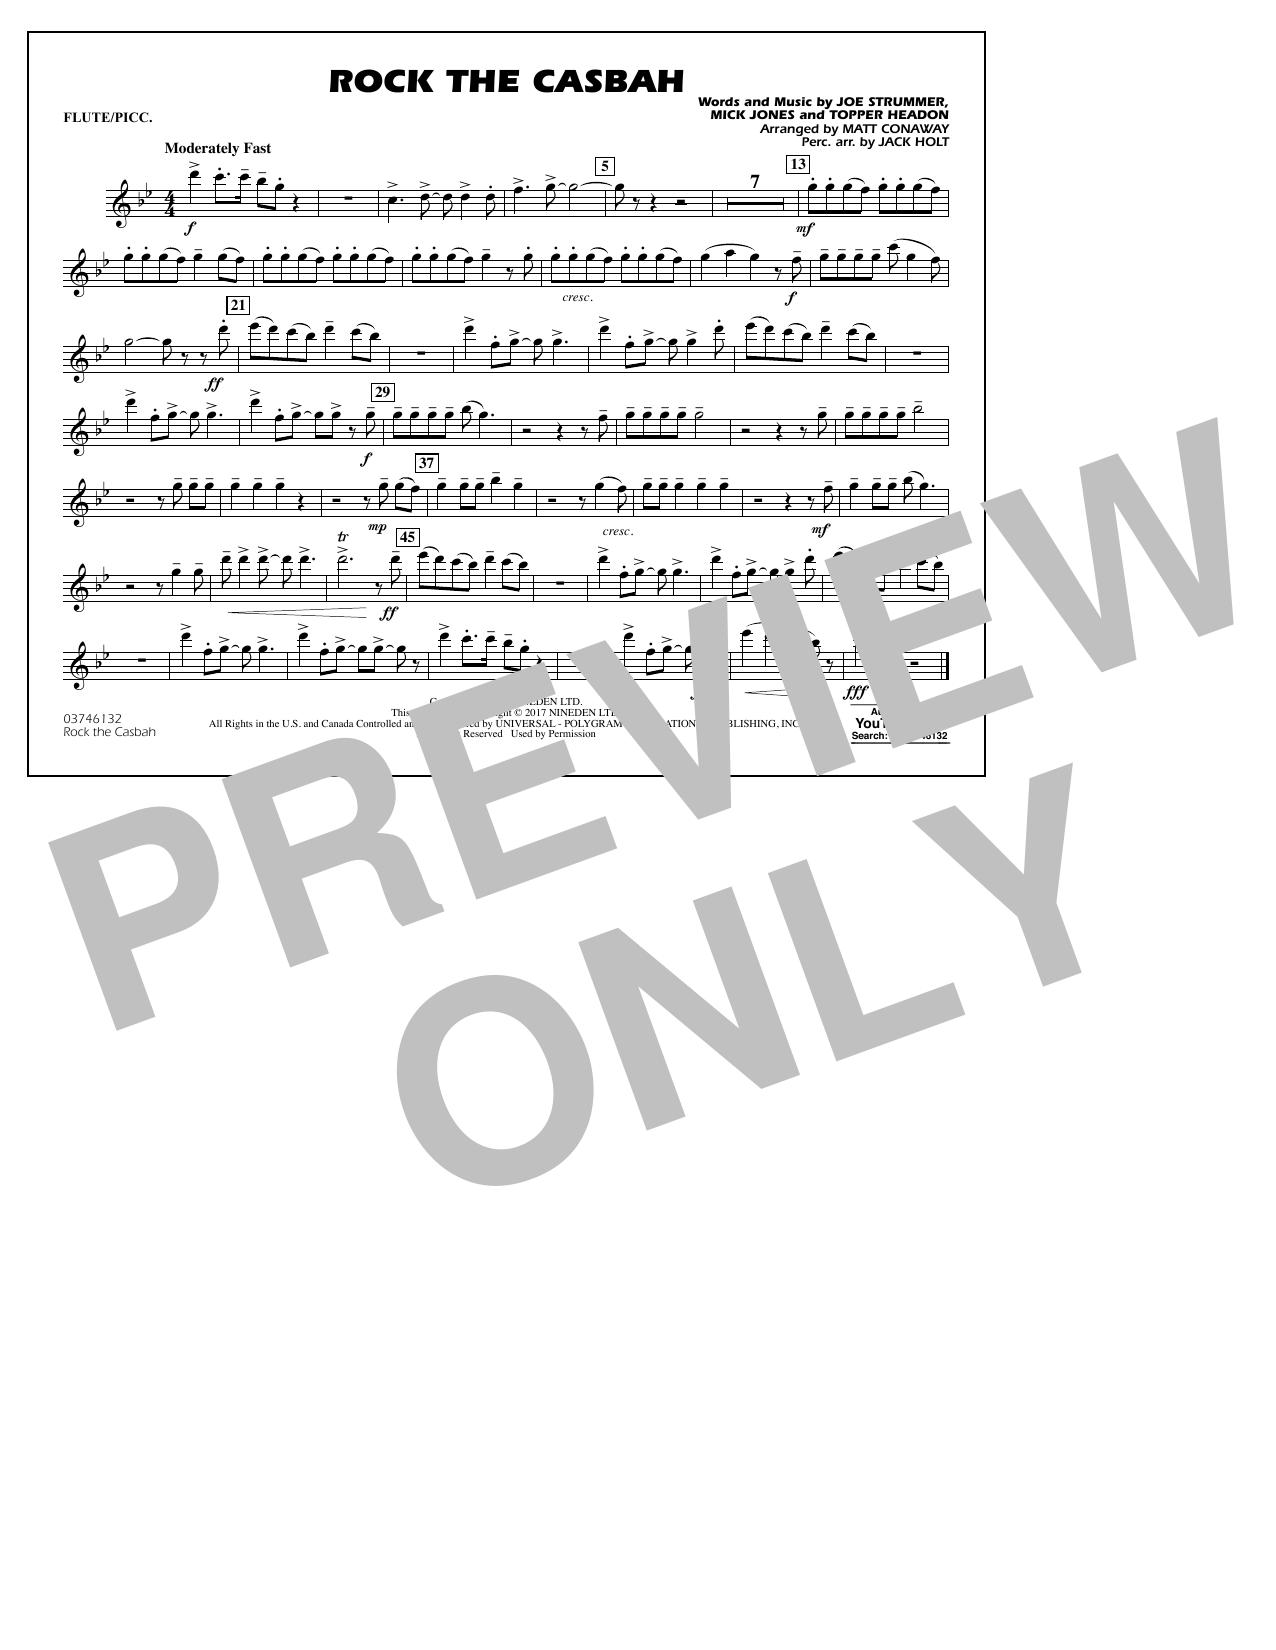 Rock the Casbah - Flute/Piccolo Sheet Music